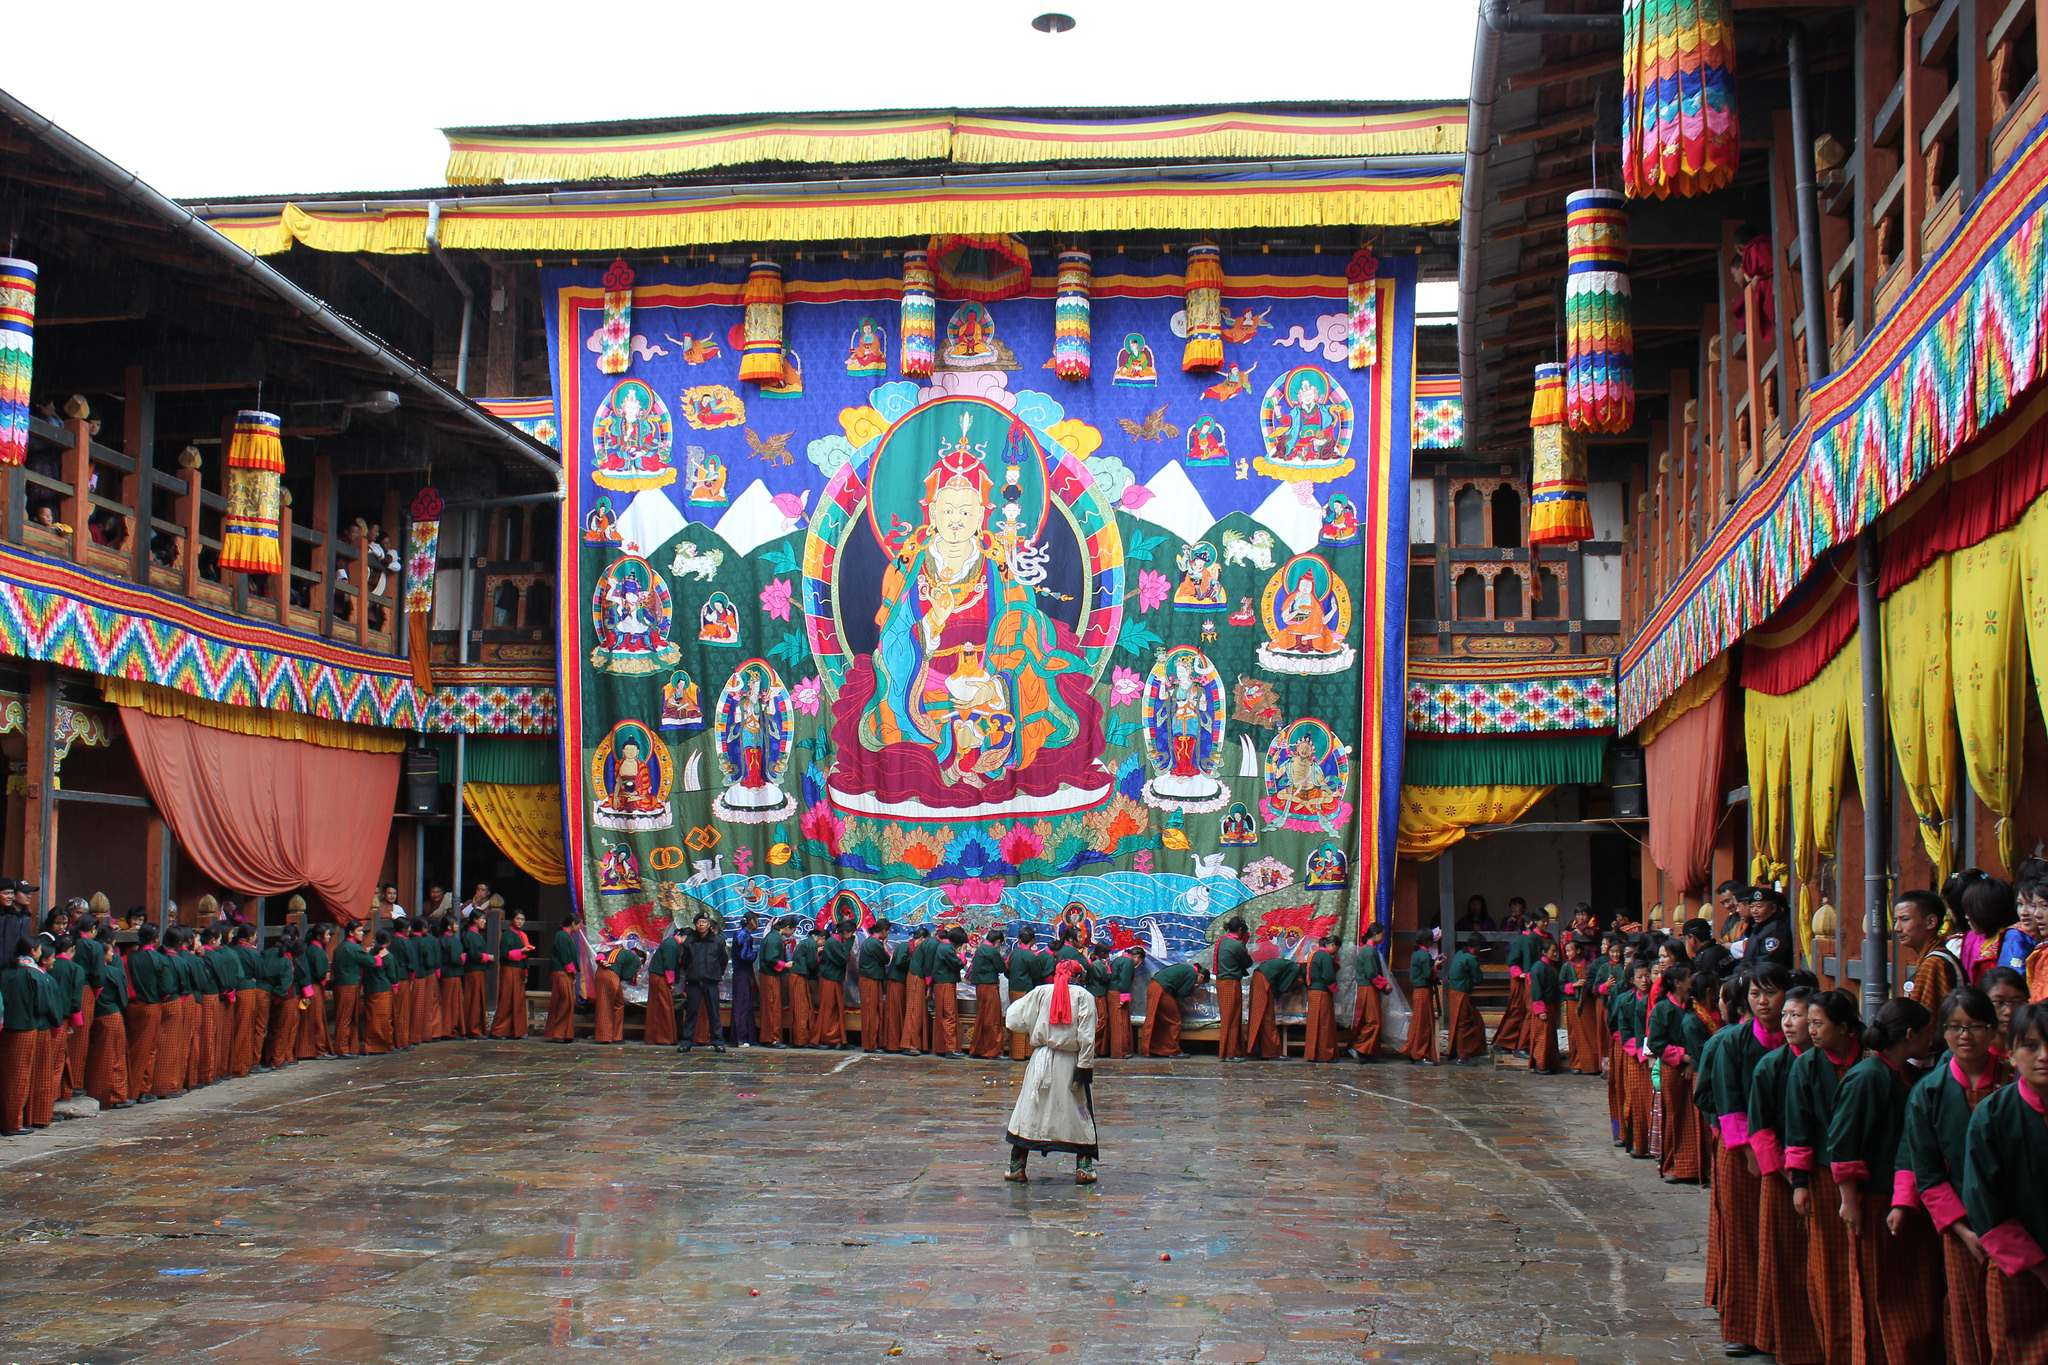 bhutan16 Bhutan   The Land of the Thunder Dragon